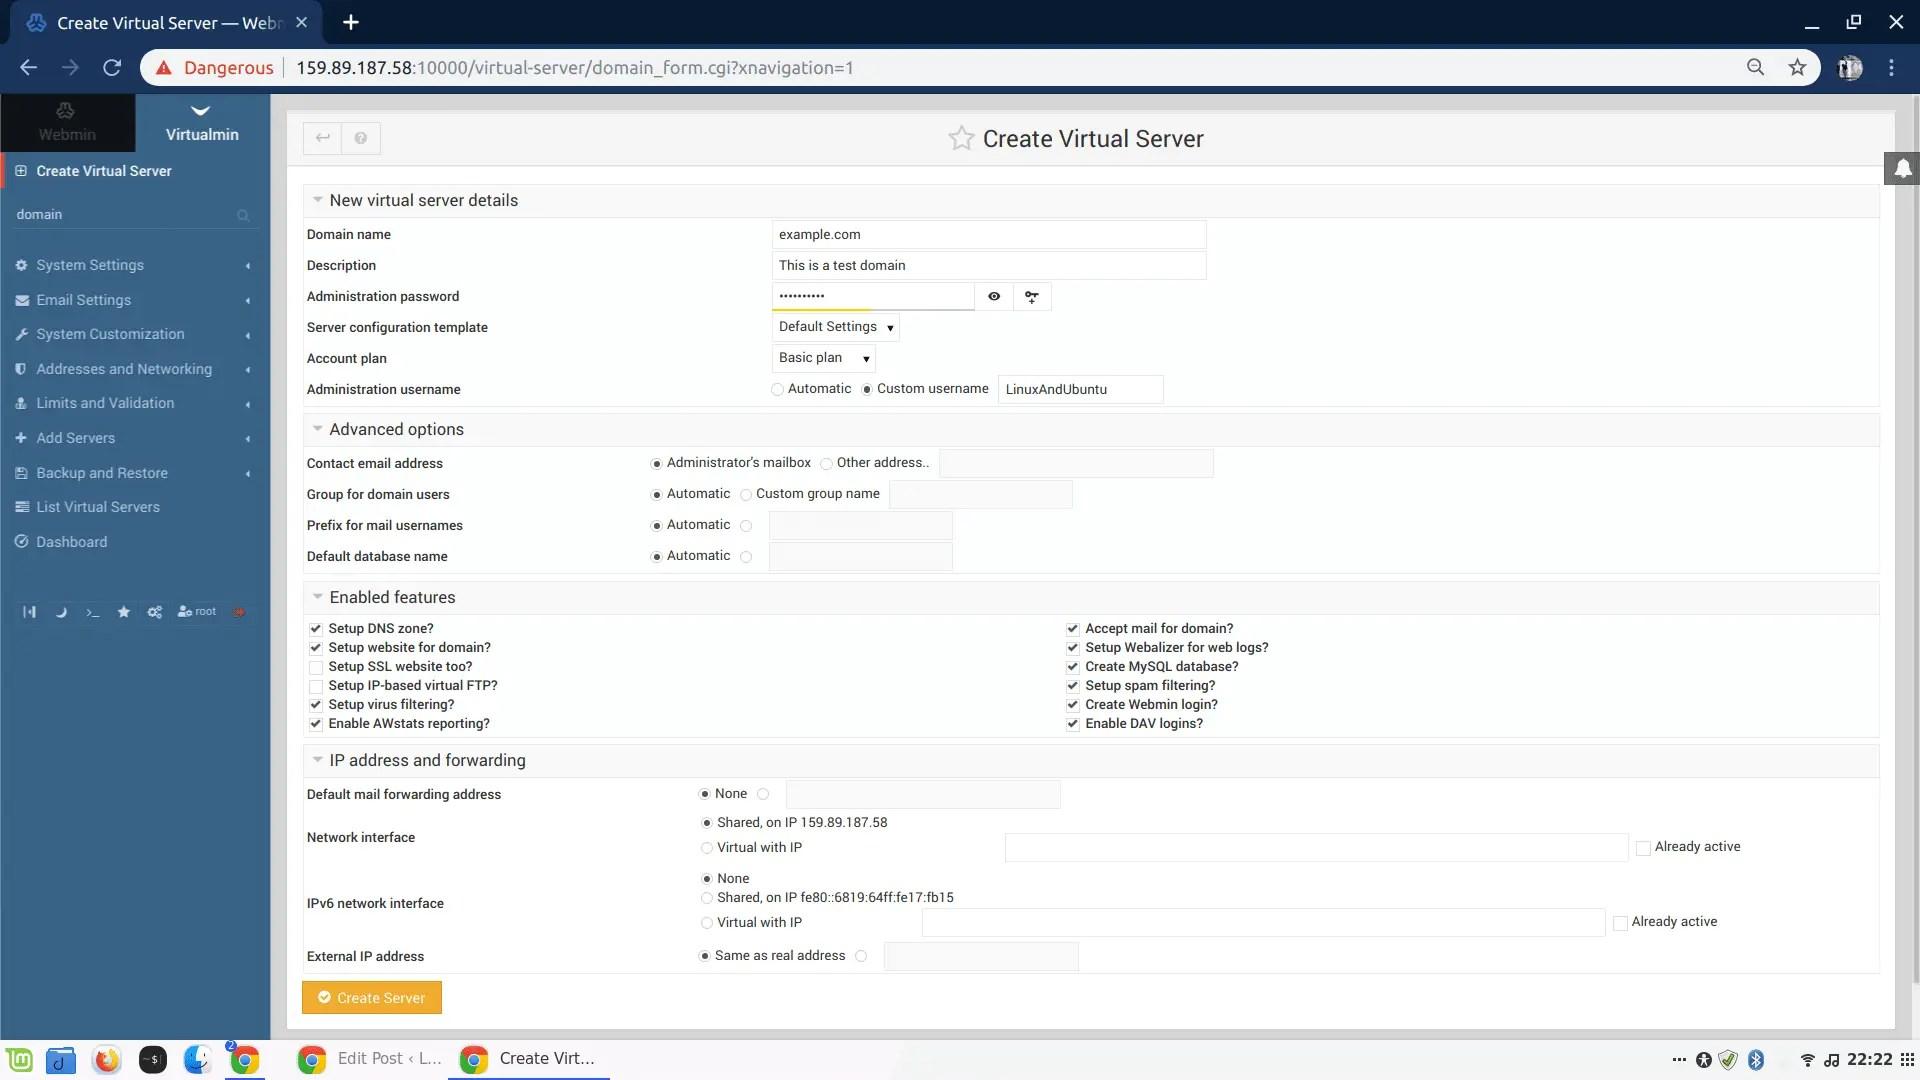 Add new virtual server Virtualmin